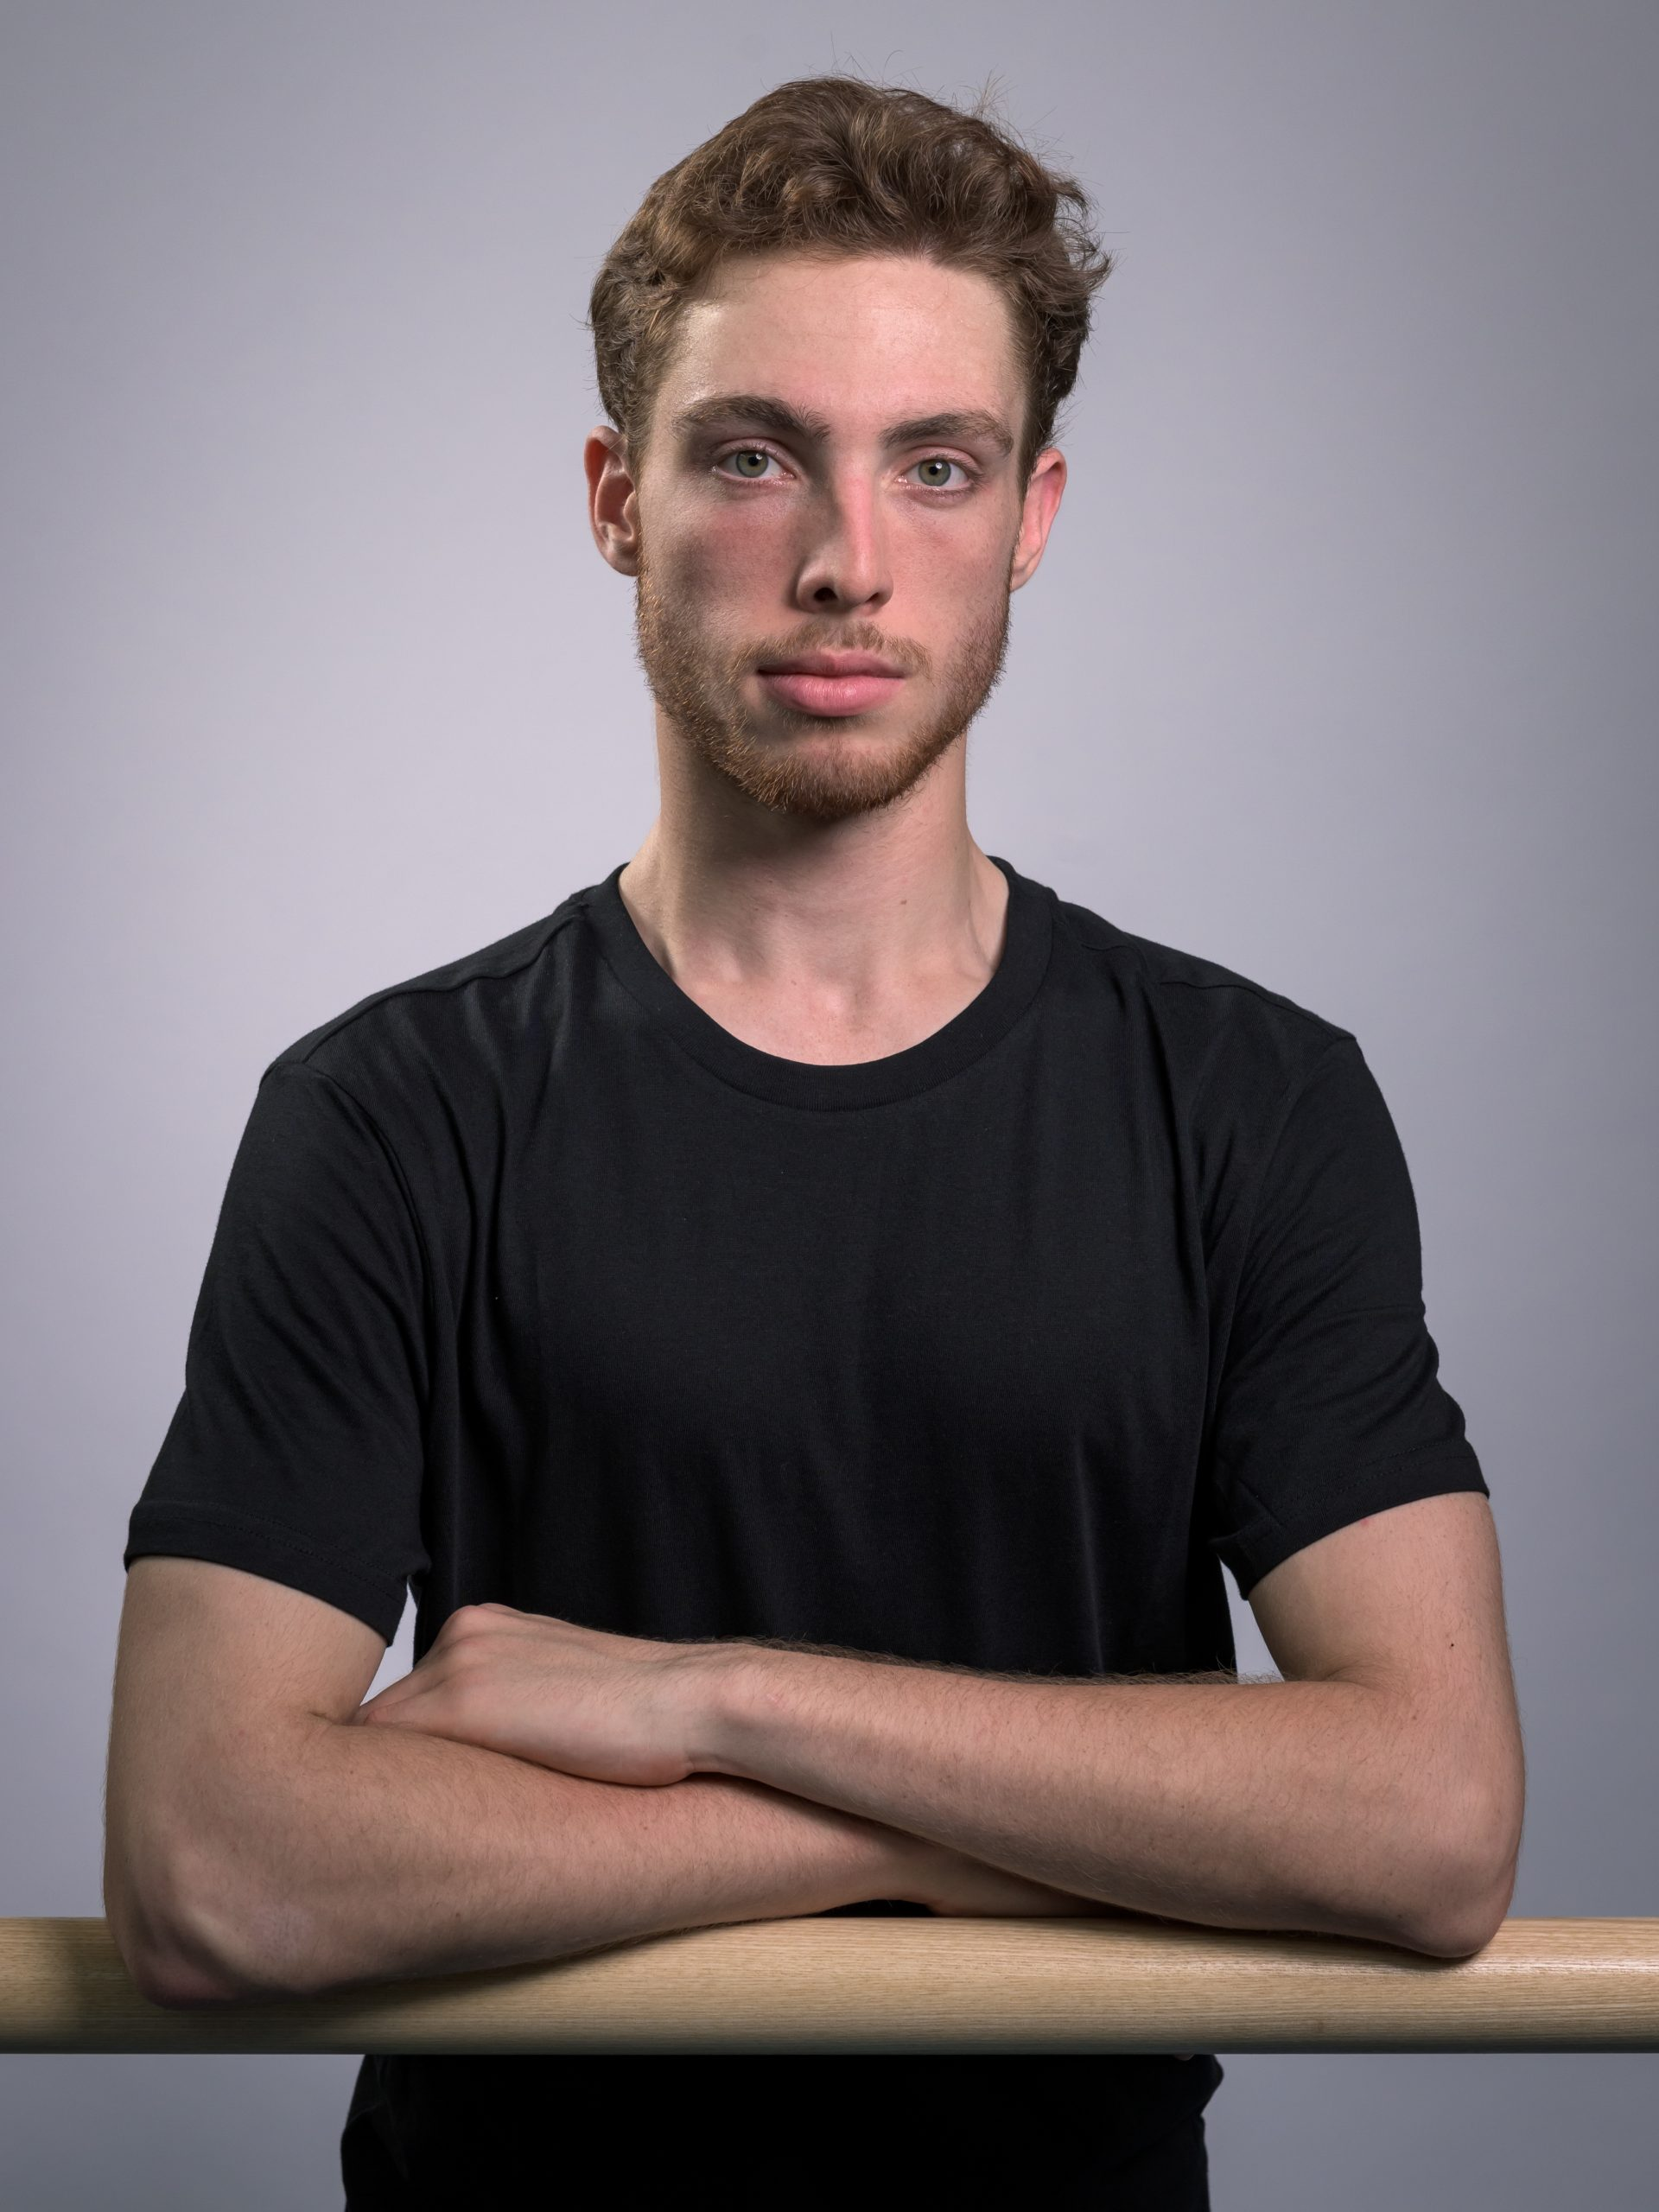 Robert Hyland (Balet)